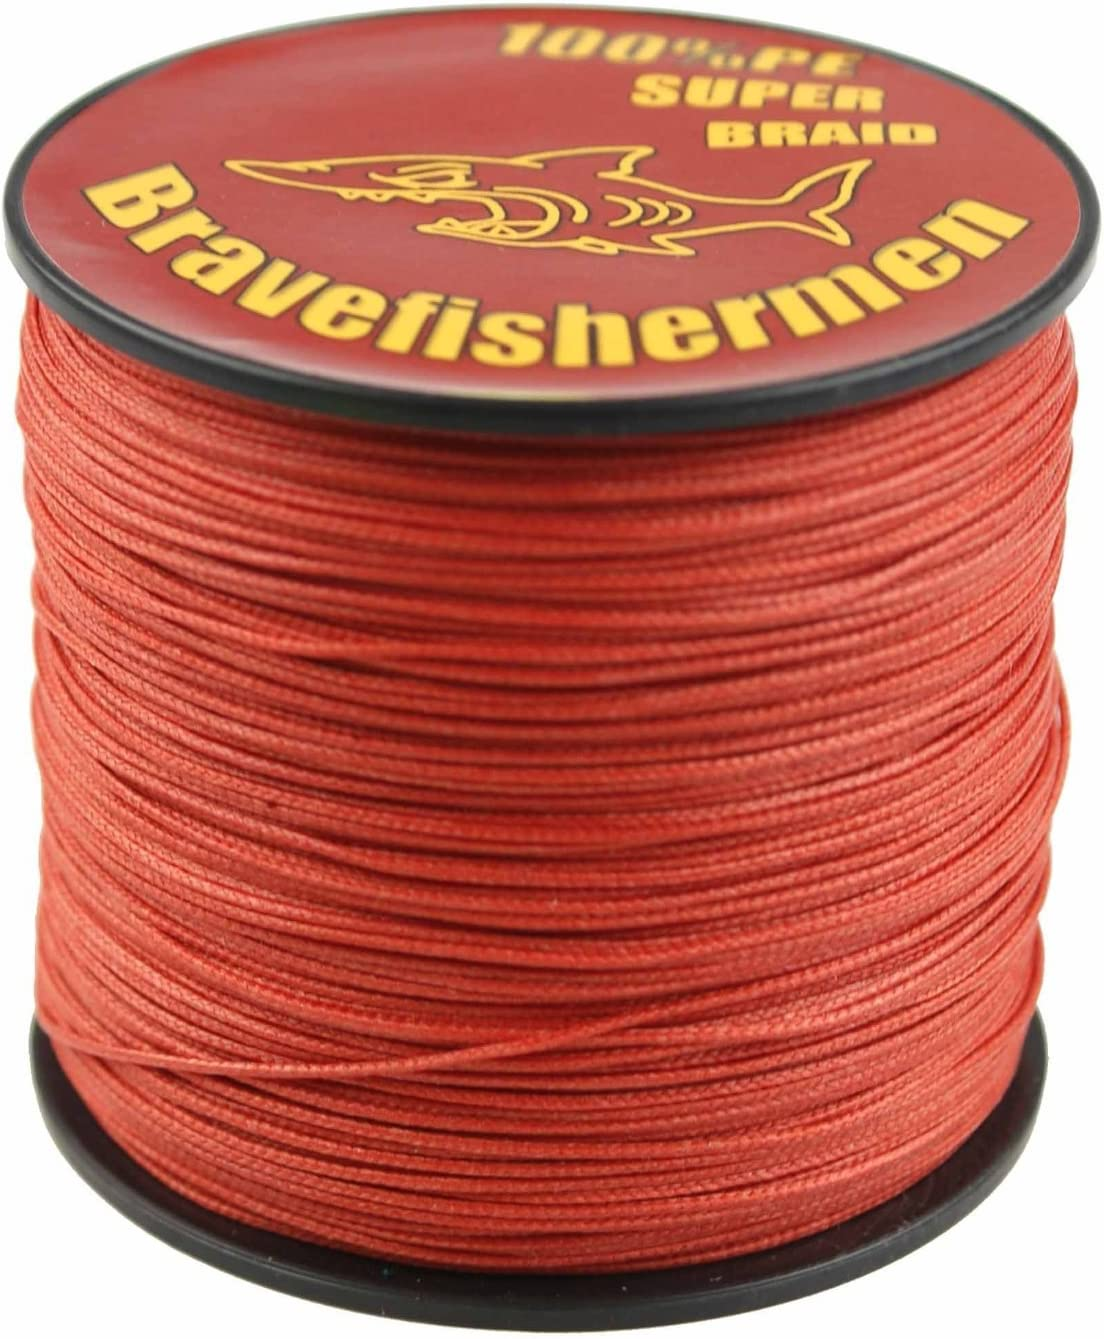 Power Pro Spectra Fiber Braided Fishing Line, Vermilion Red, 150YD 15LB